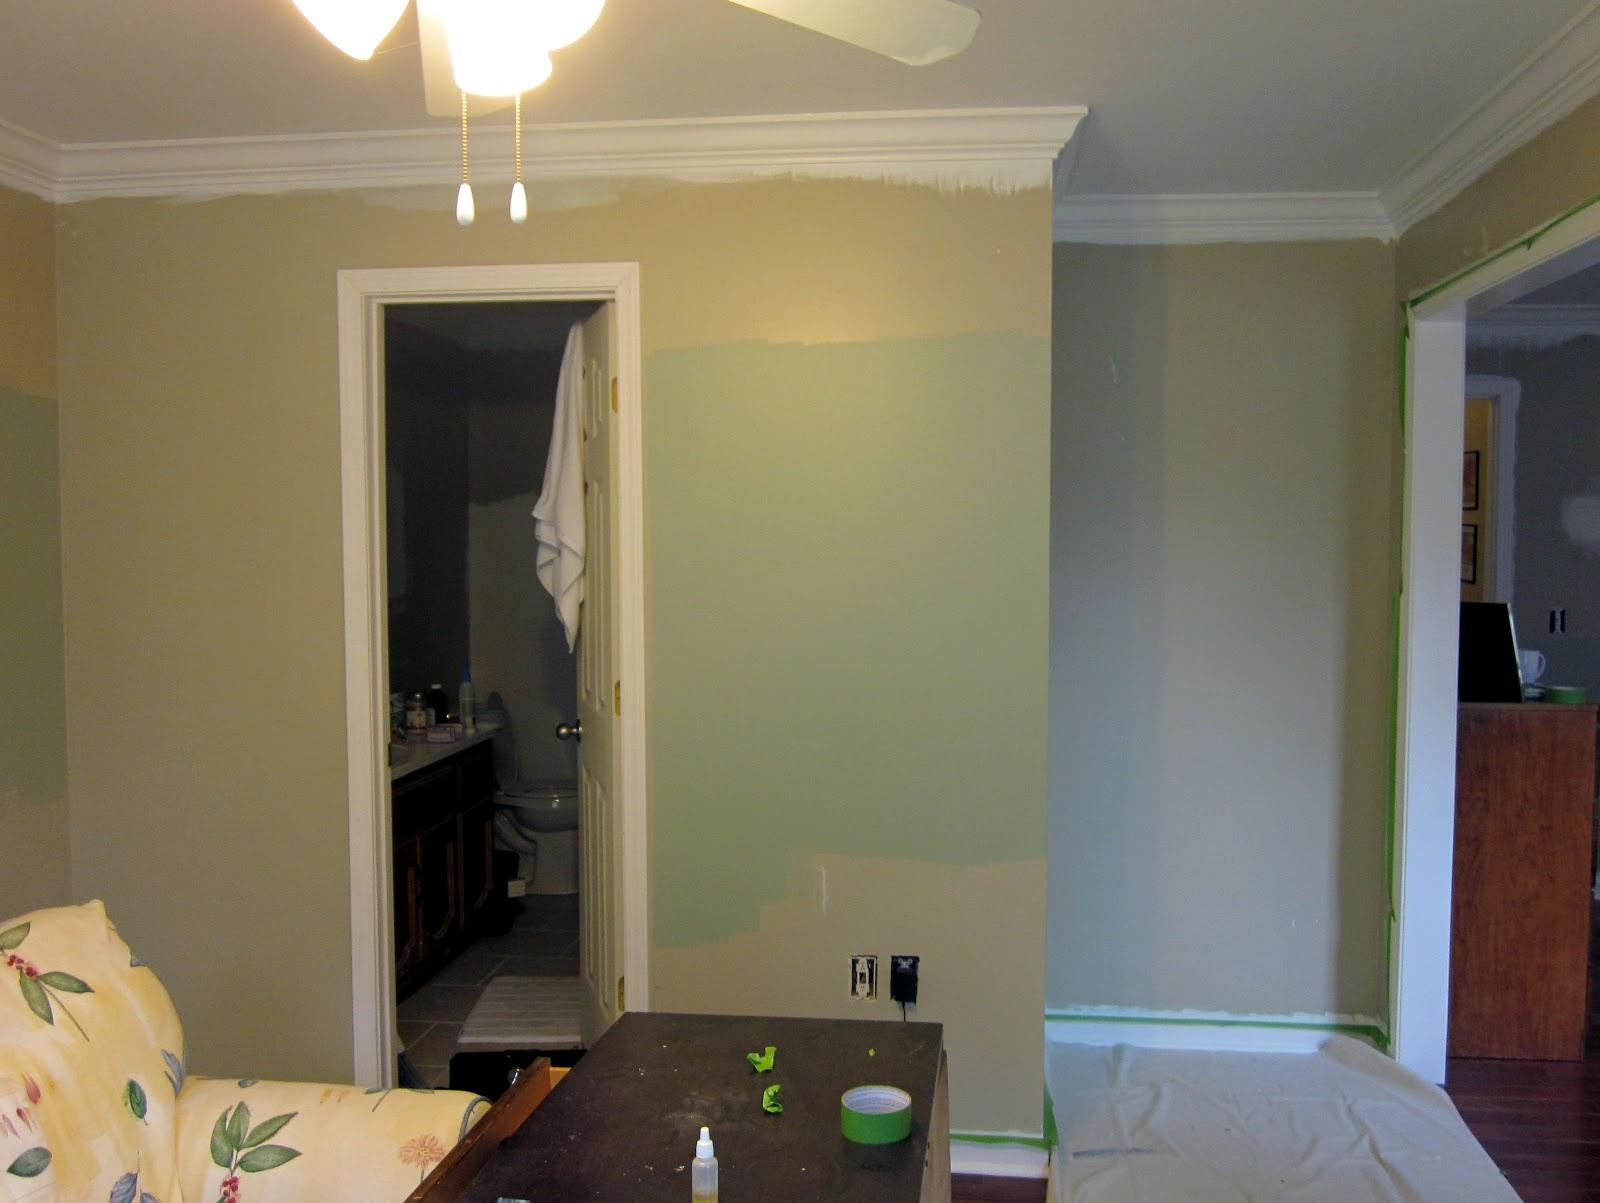 Bedroom Bench Craigslist